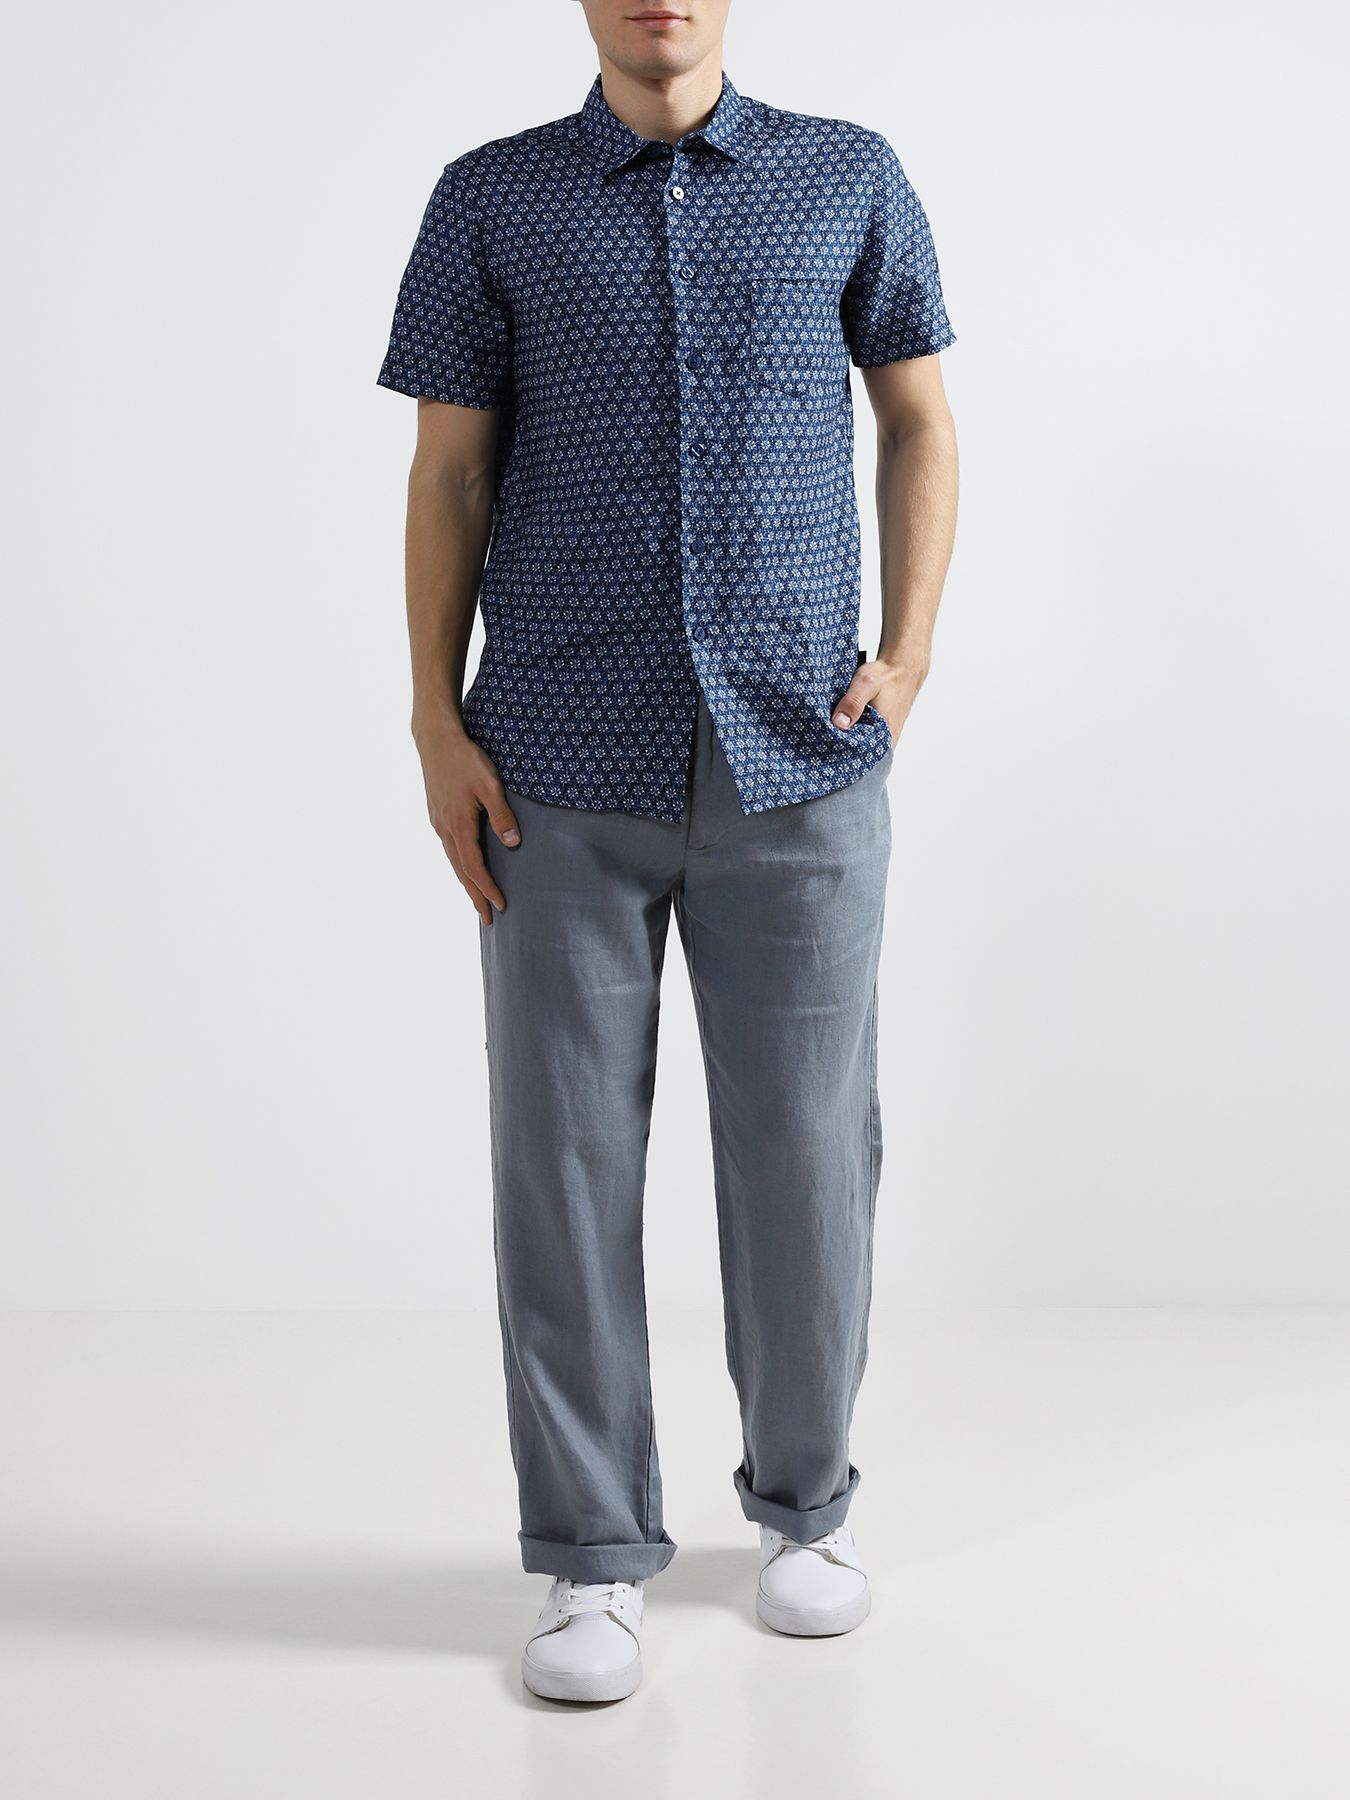 Alessandro Manzoni Jeans Льняные брюки фото